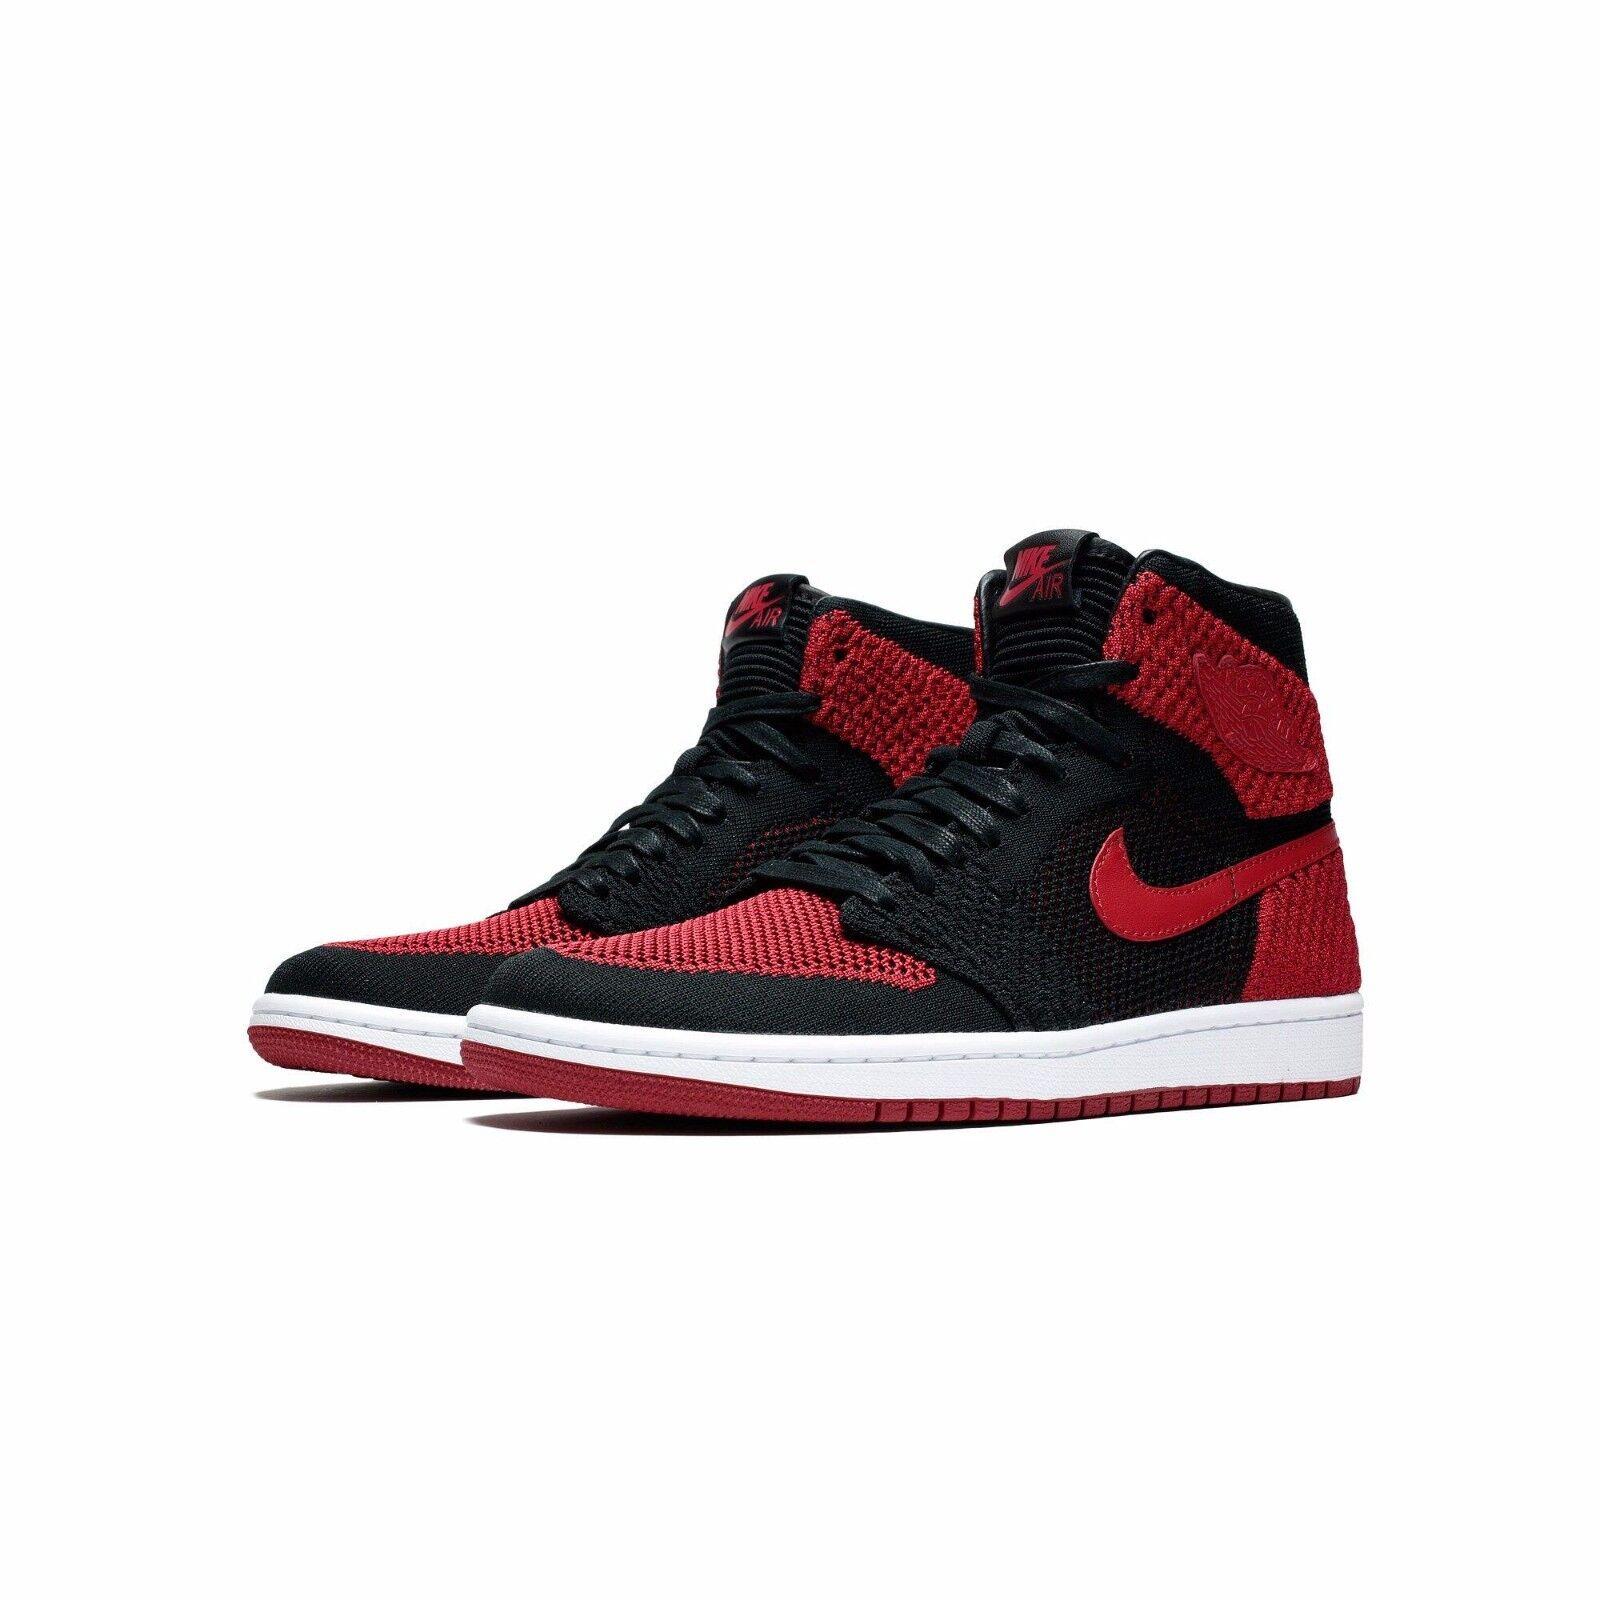 Nike Air Flyknit Jordan 1 retro High Flyknit Air negro rojo 919704-001 criados prohibido 2b1686